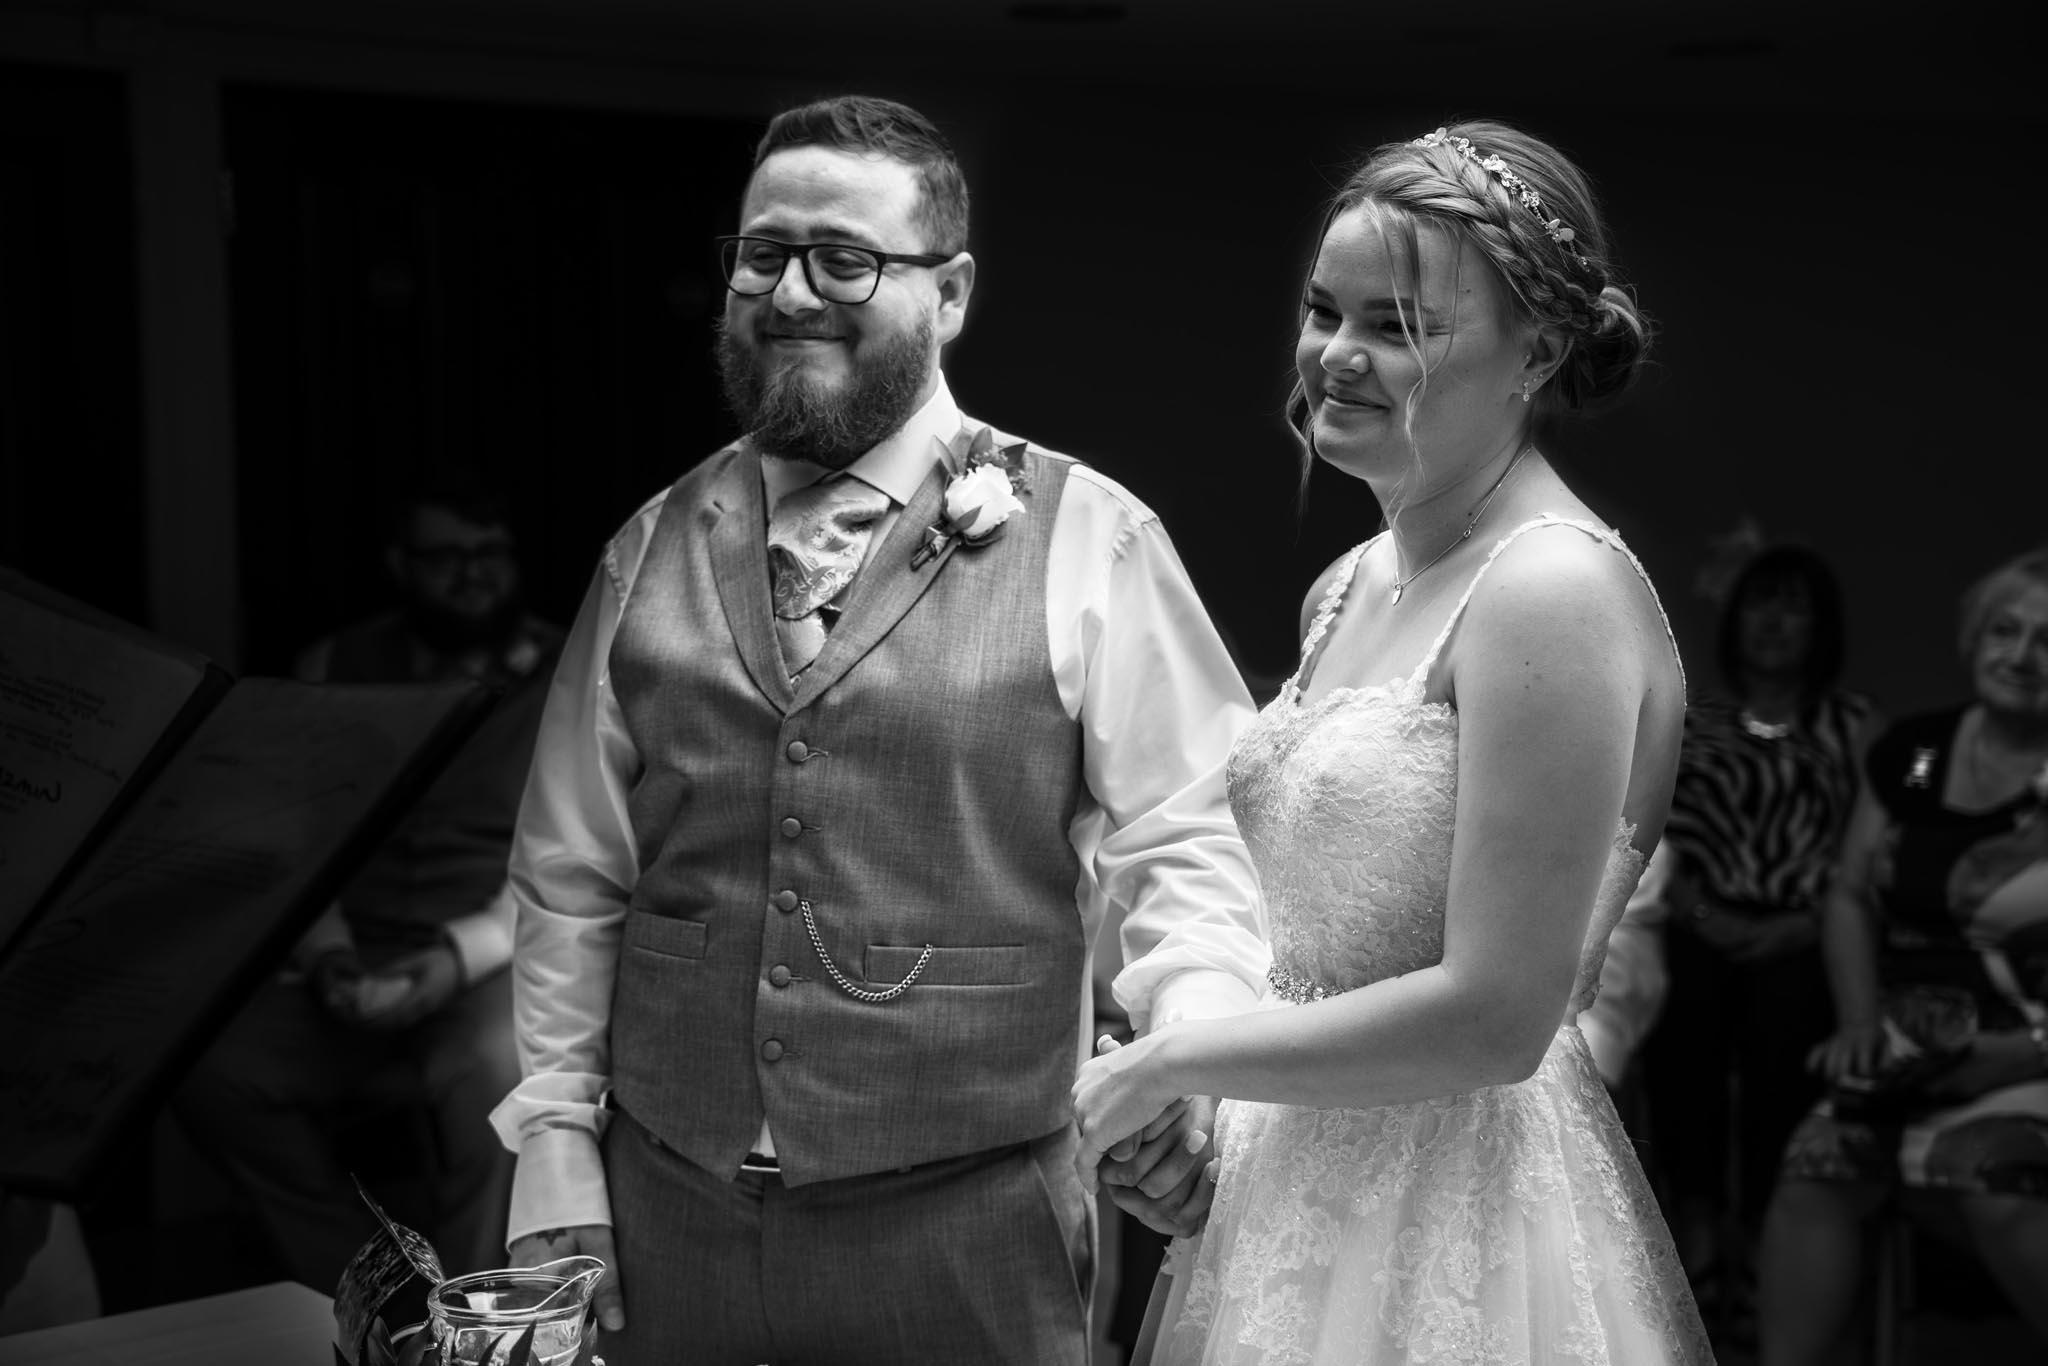 313-Ceremony-Luke-Yasmin-The-Rayleigh-Club-Wedding-Photography.jpg